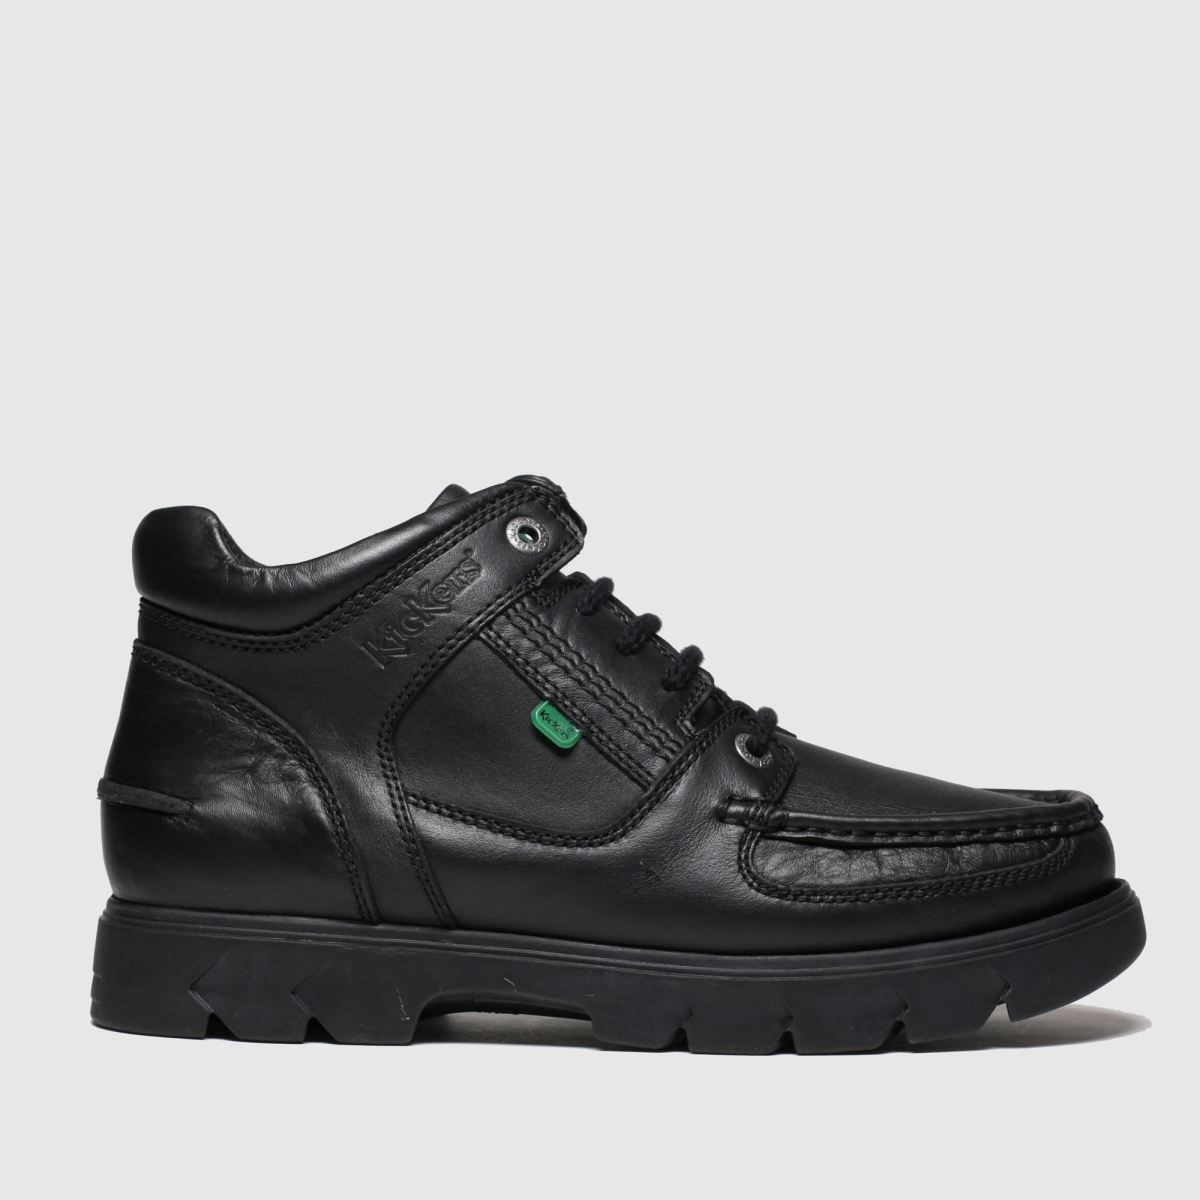 Kickers Black Lennon Mid Boots